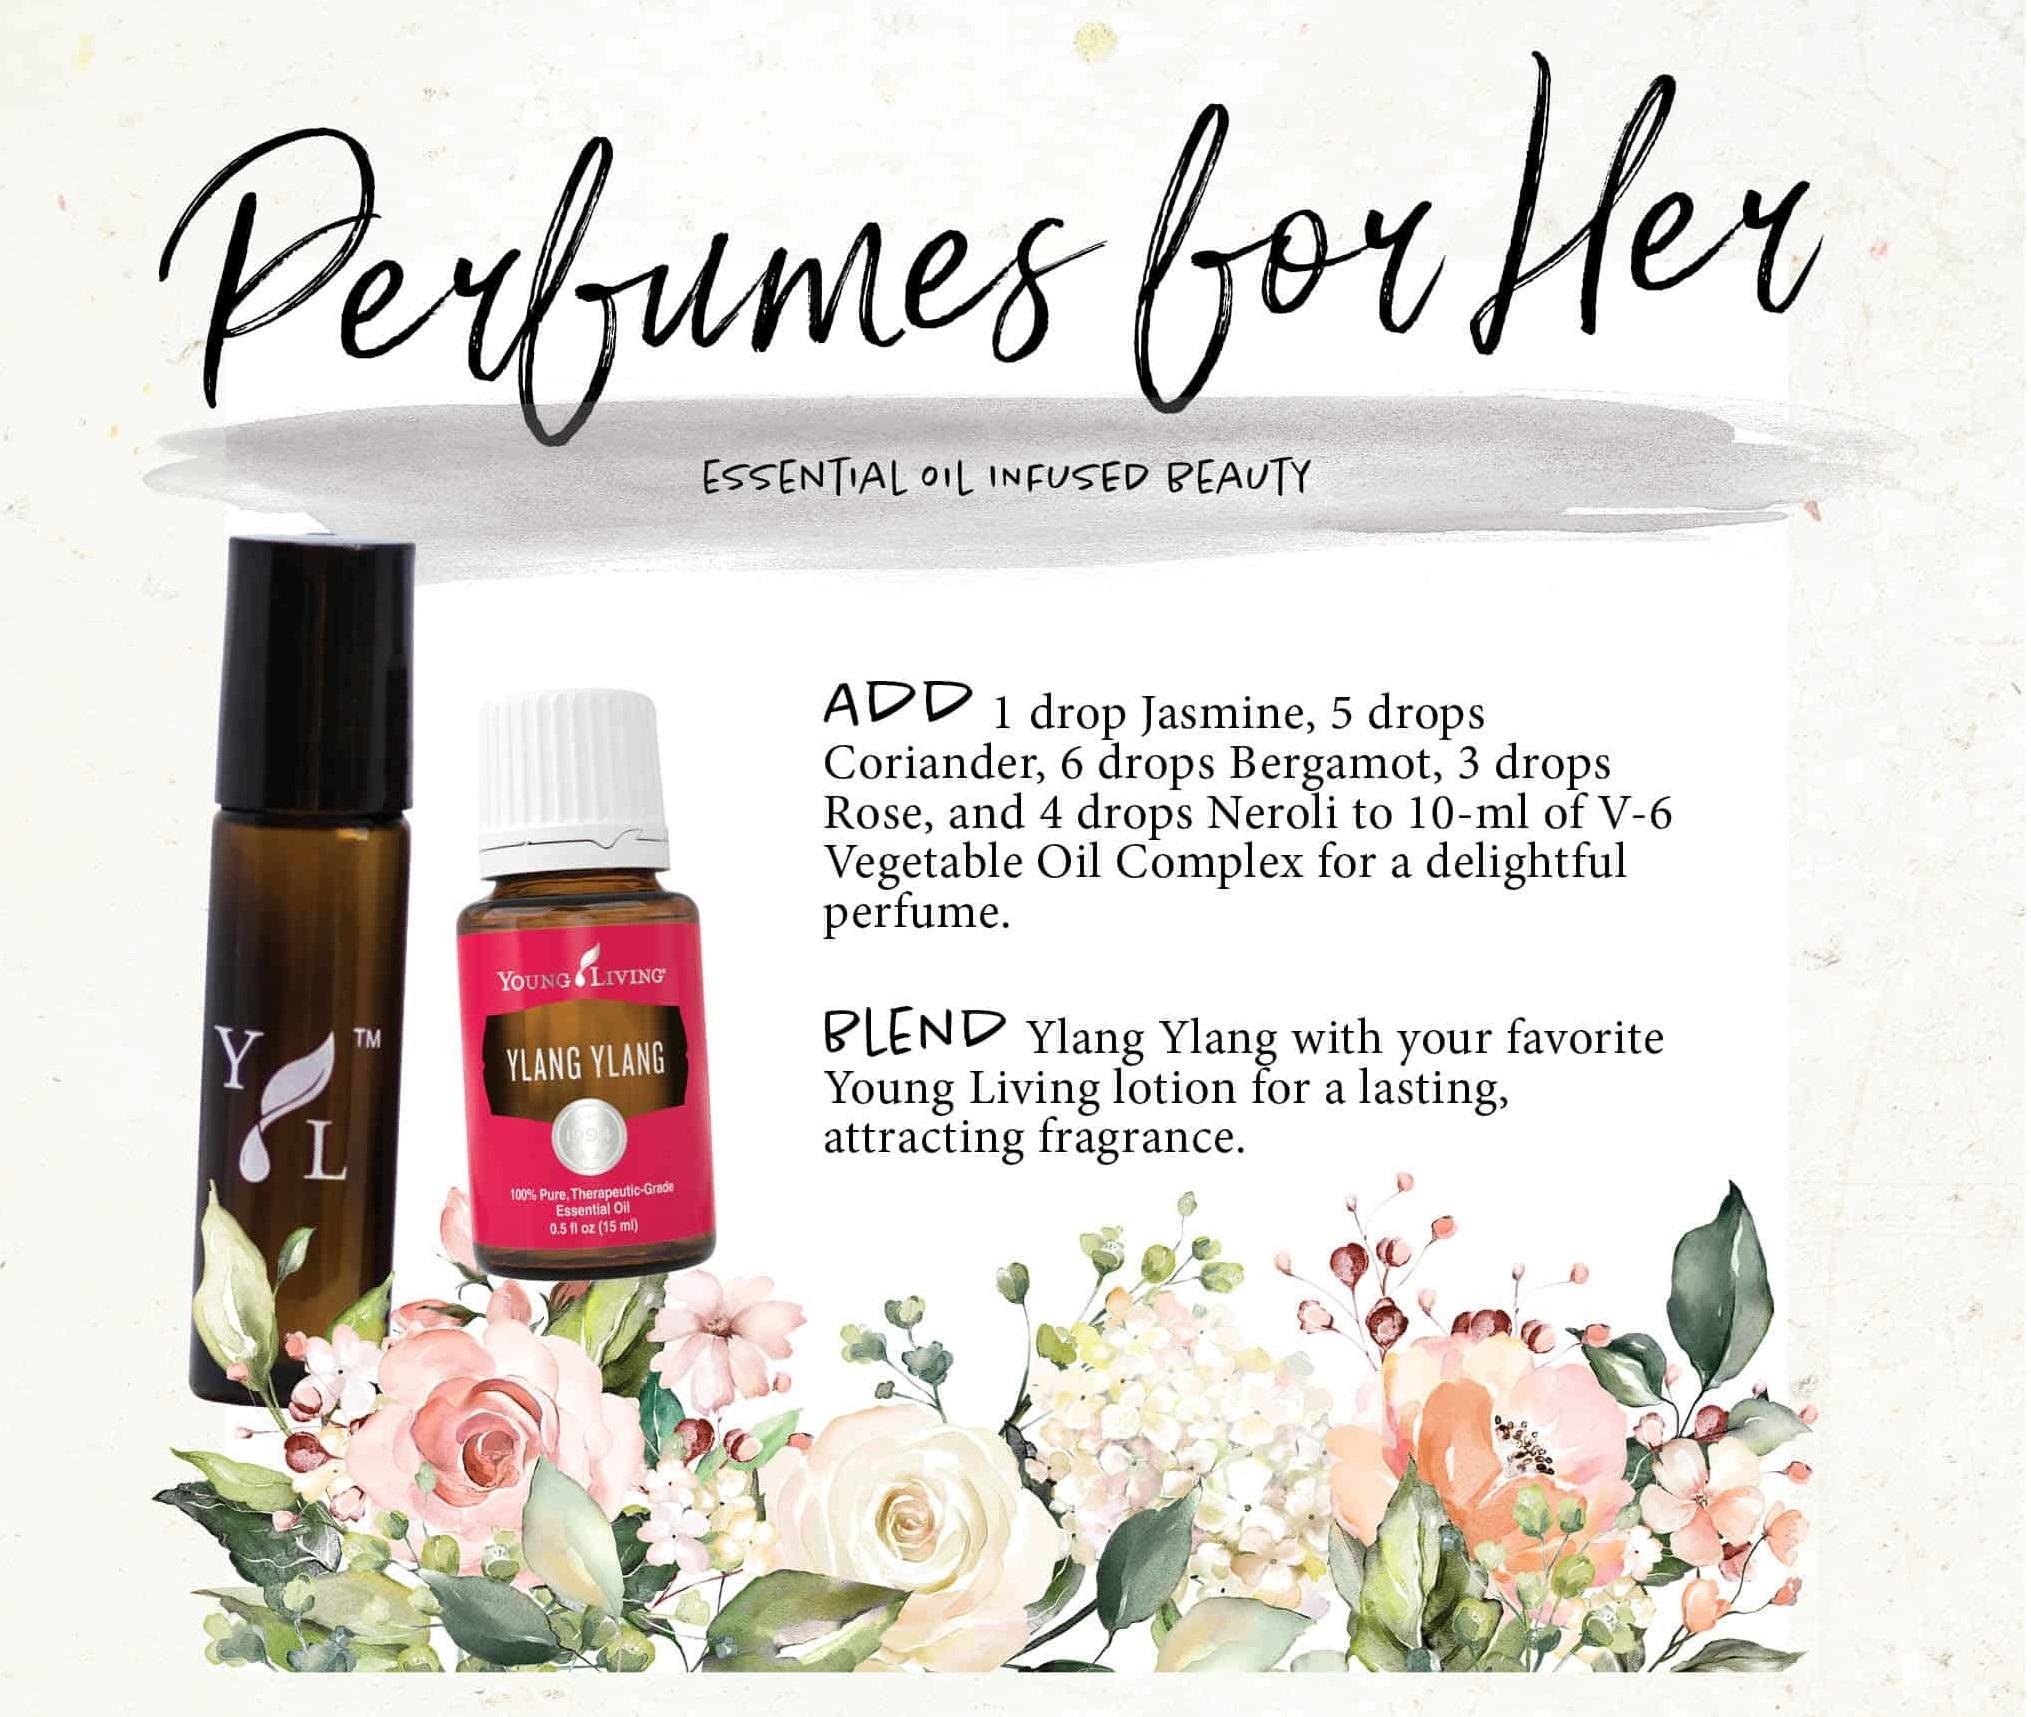 VDay6-Perfume.jpg